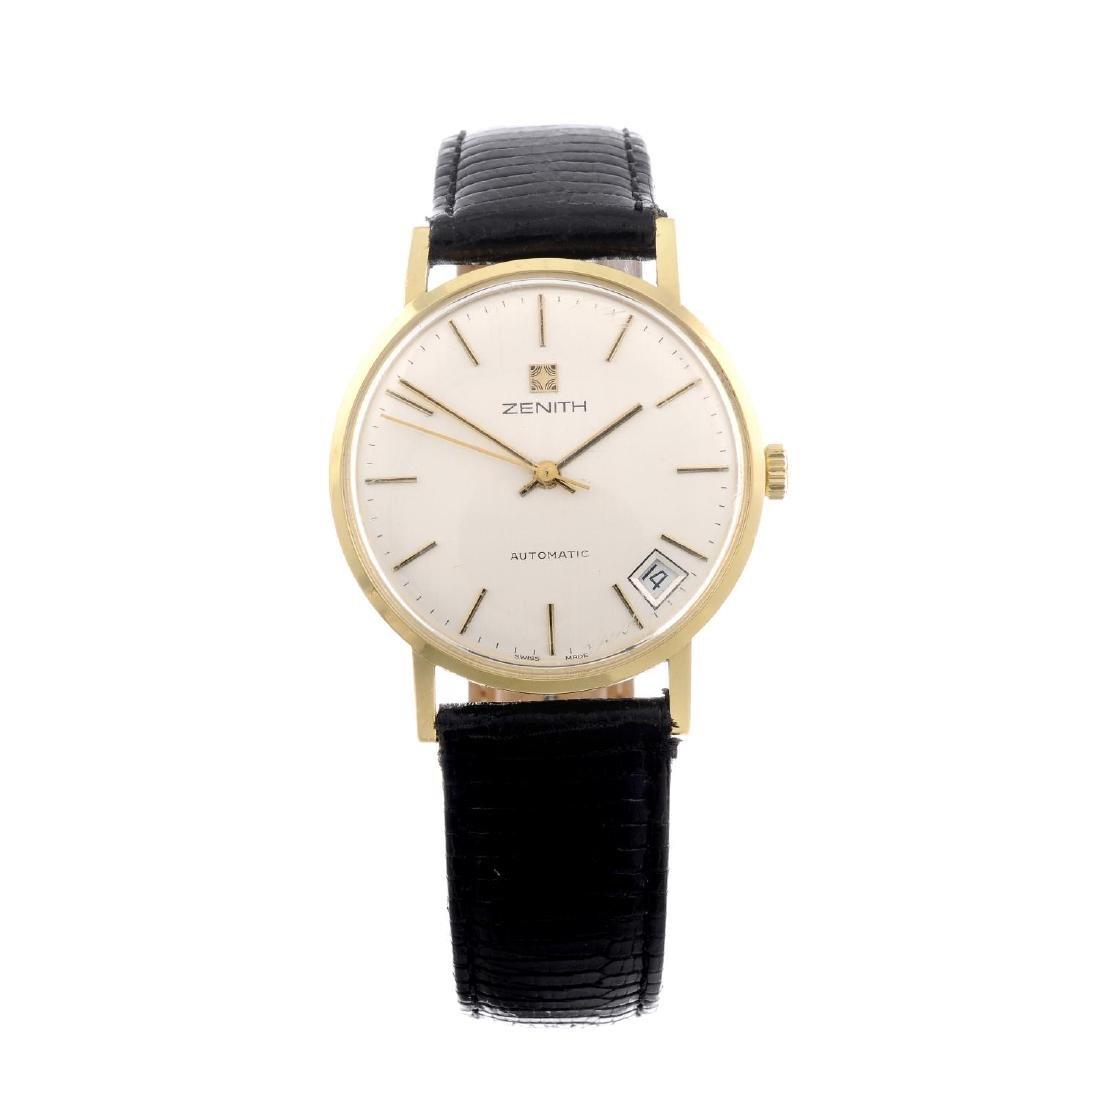 ZENITH - a gentleman's wrist watch. Yellow metal case,